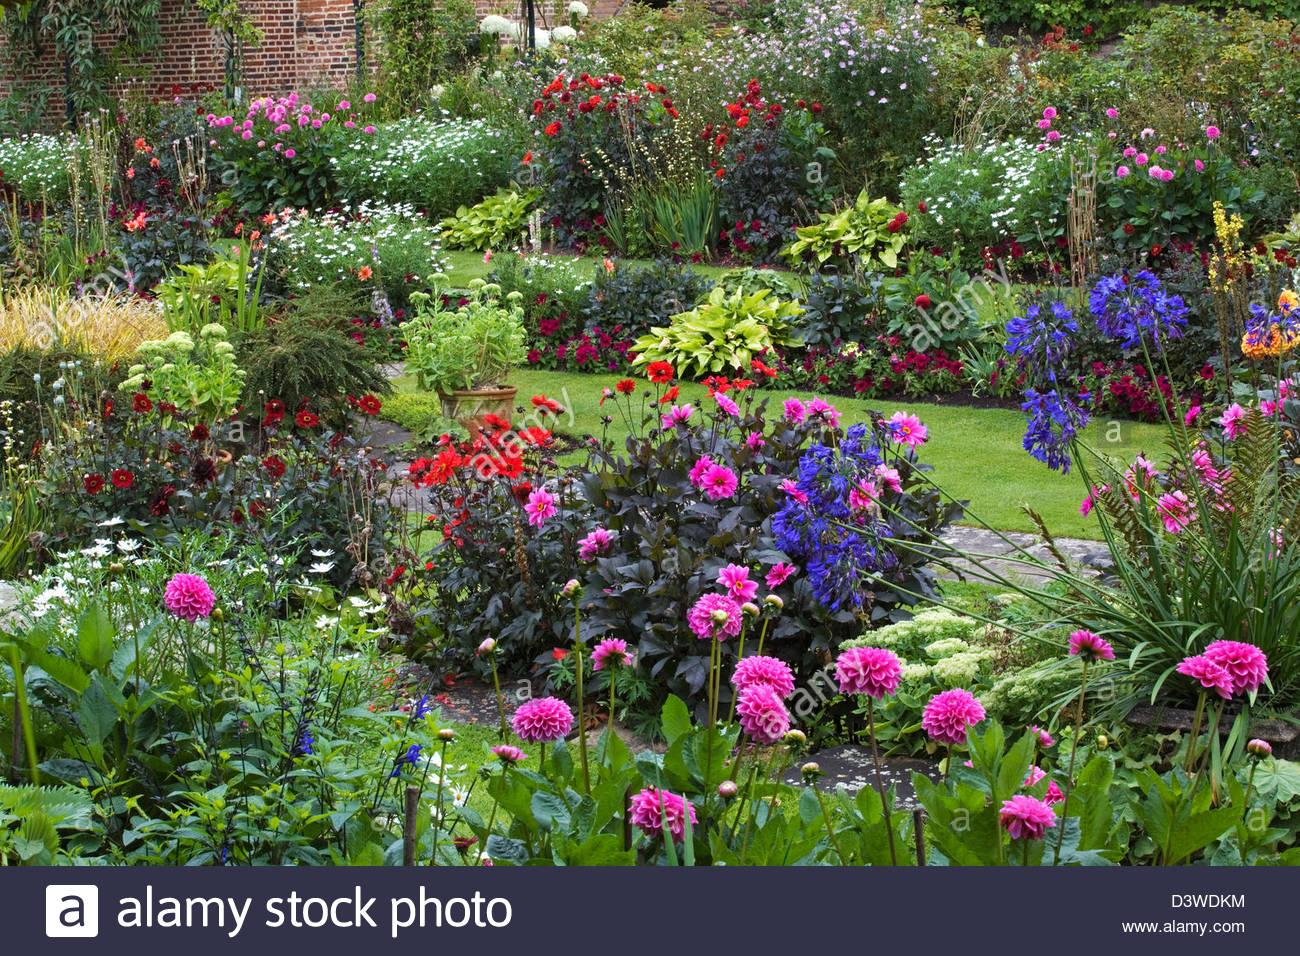 english garden - chenies manor gardens, uk stock photo, royalty